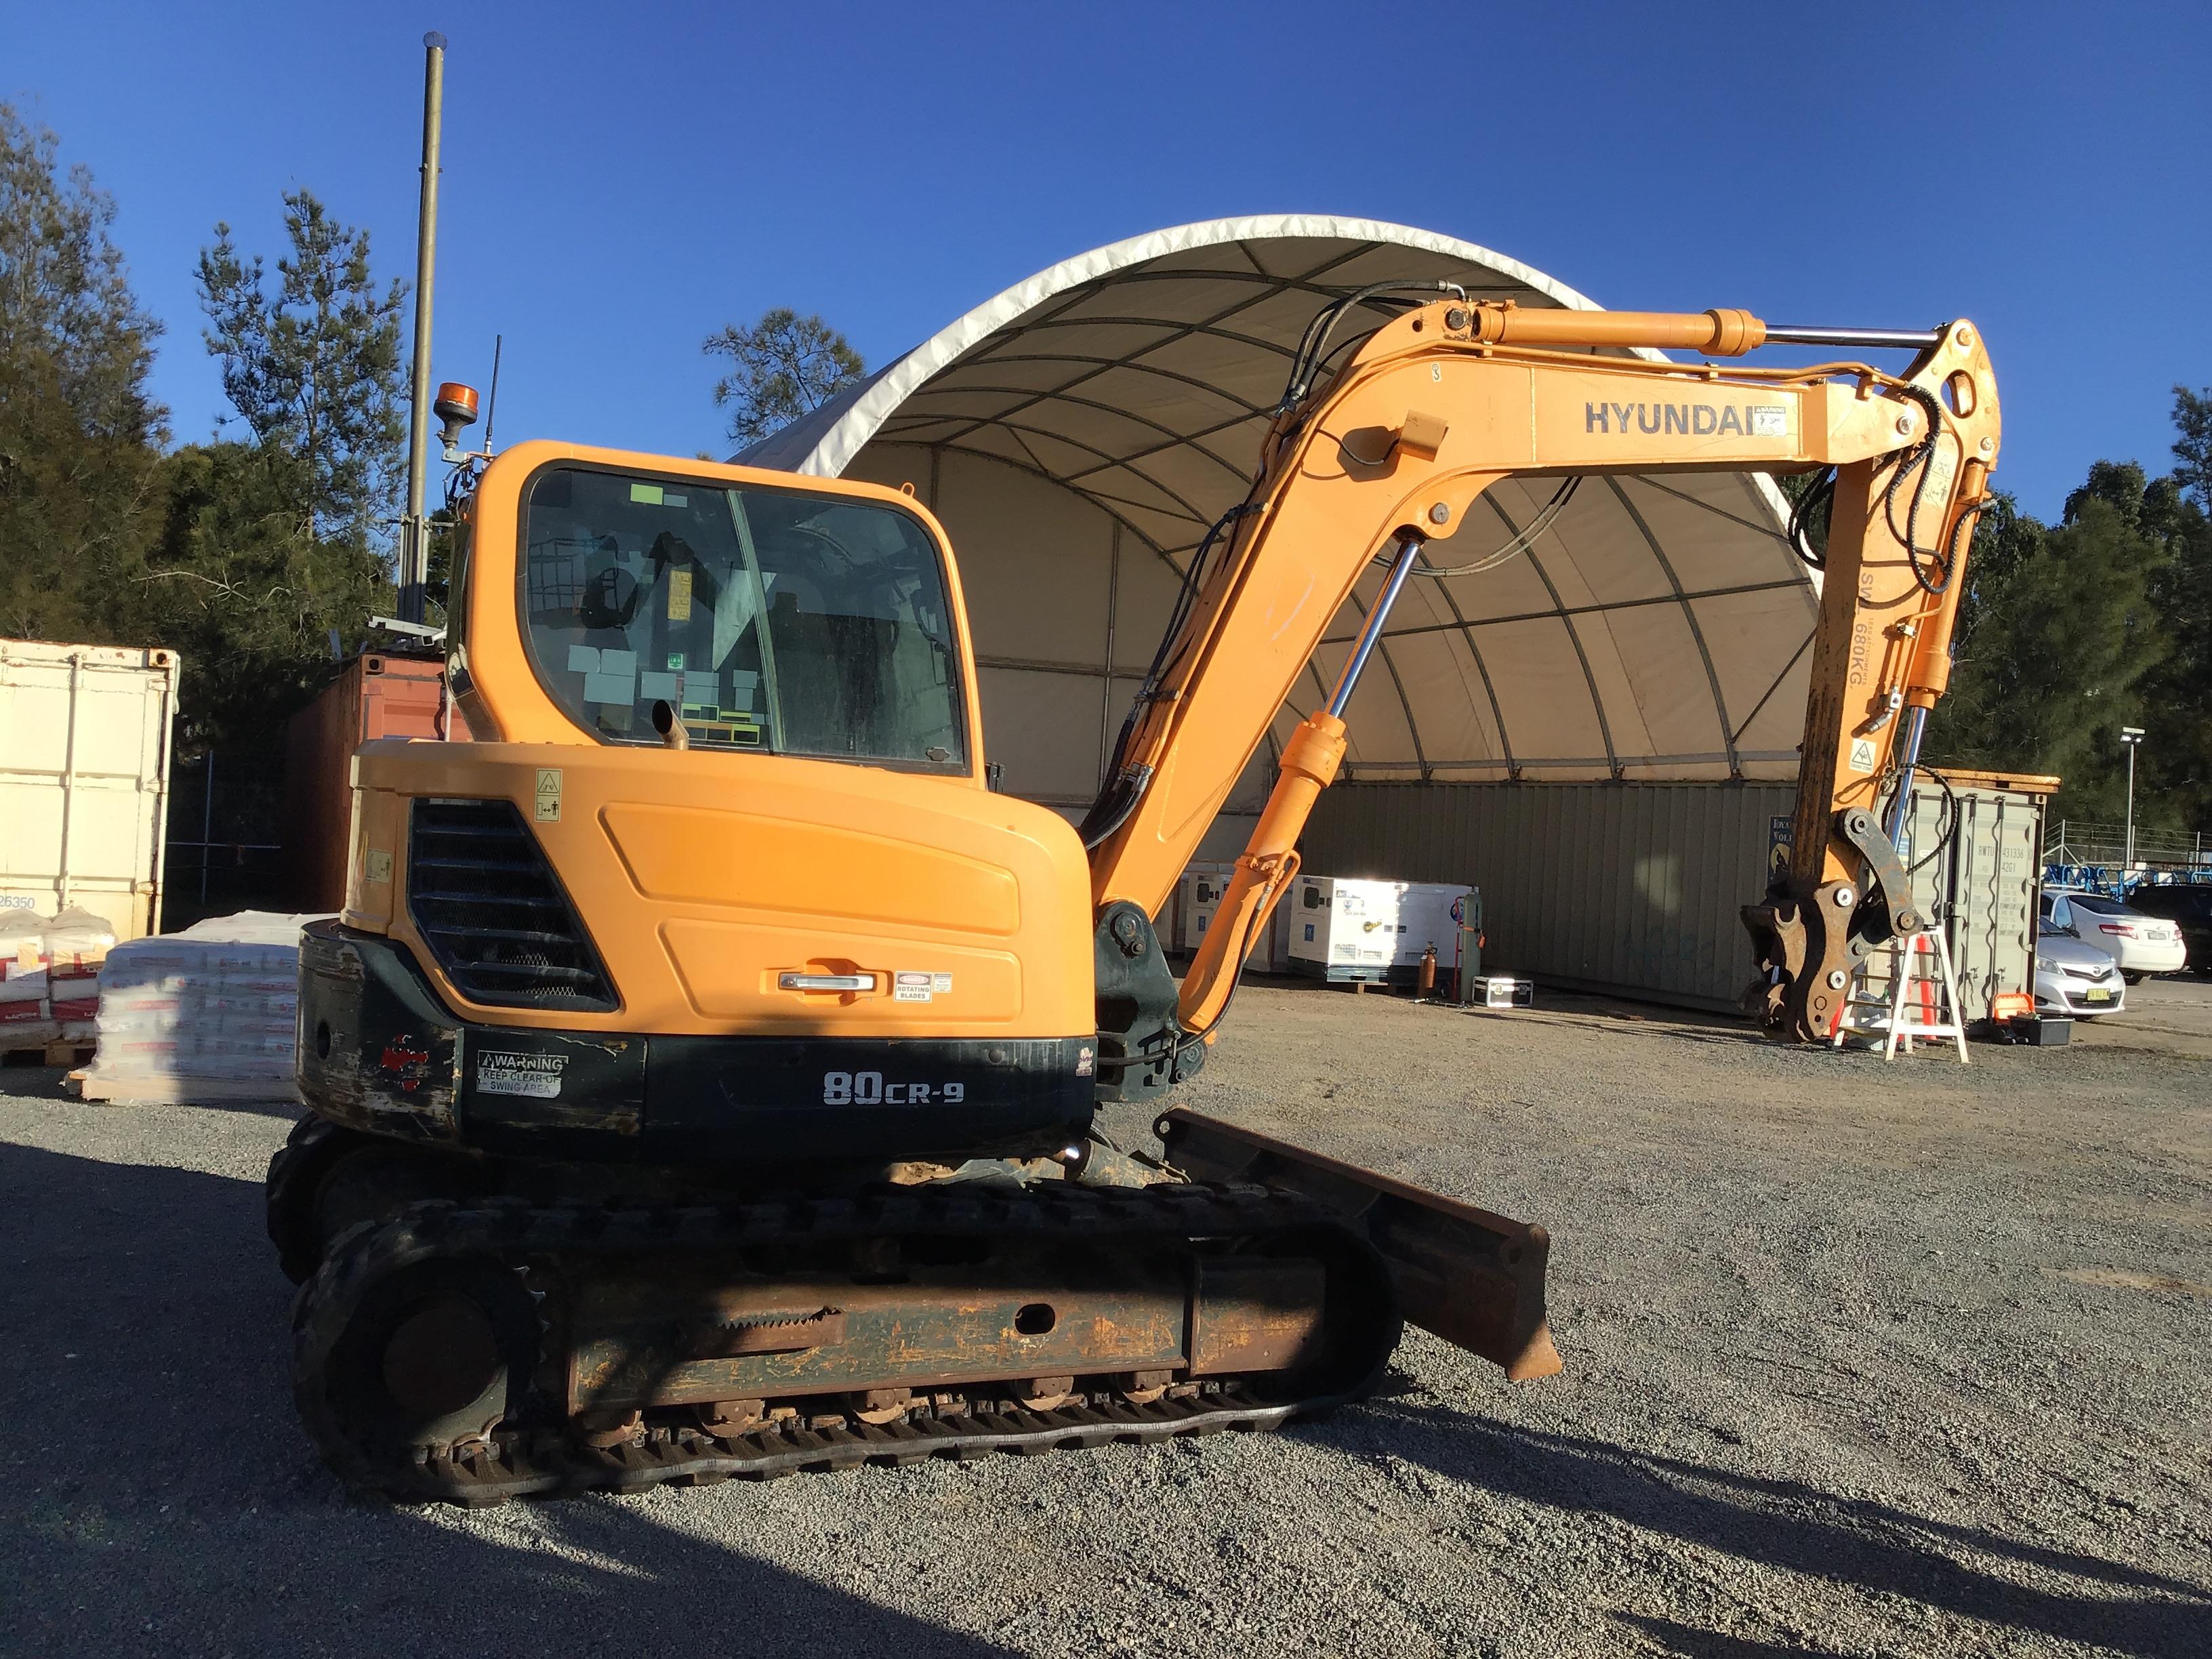 2014 Hyundai ROBEX80CR-9 Excavator